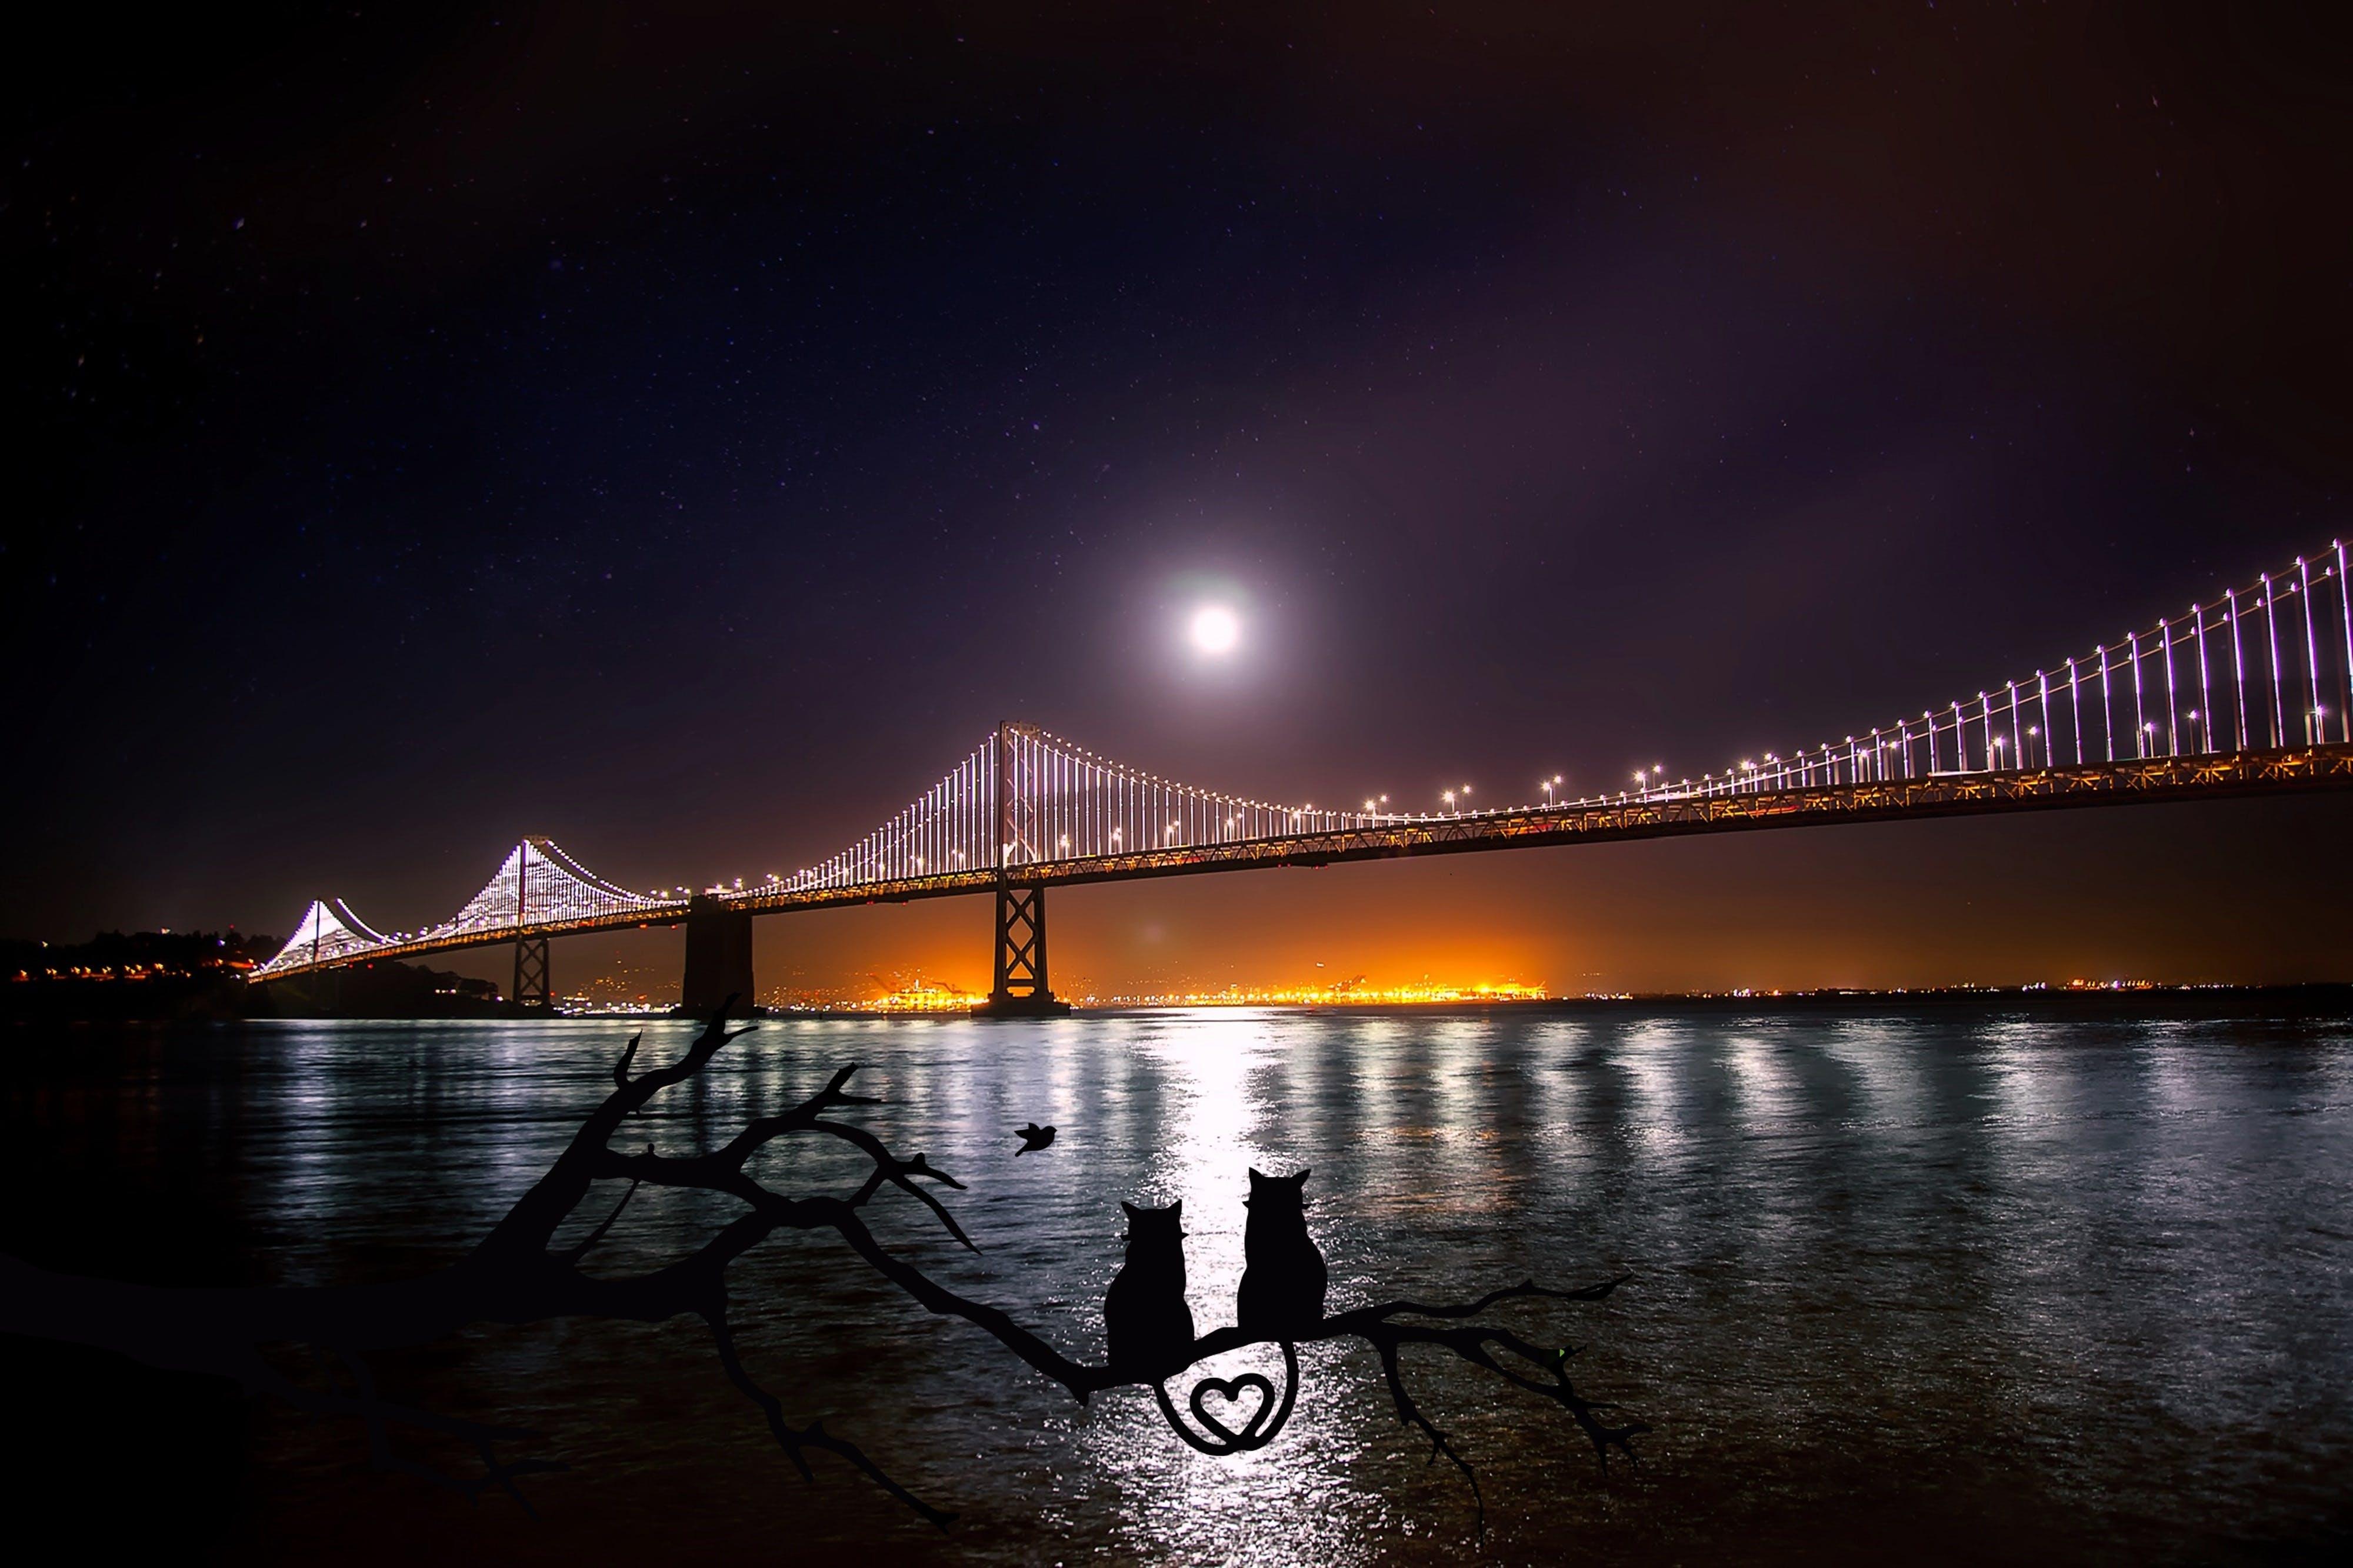 Grey Suspension Bridges